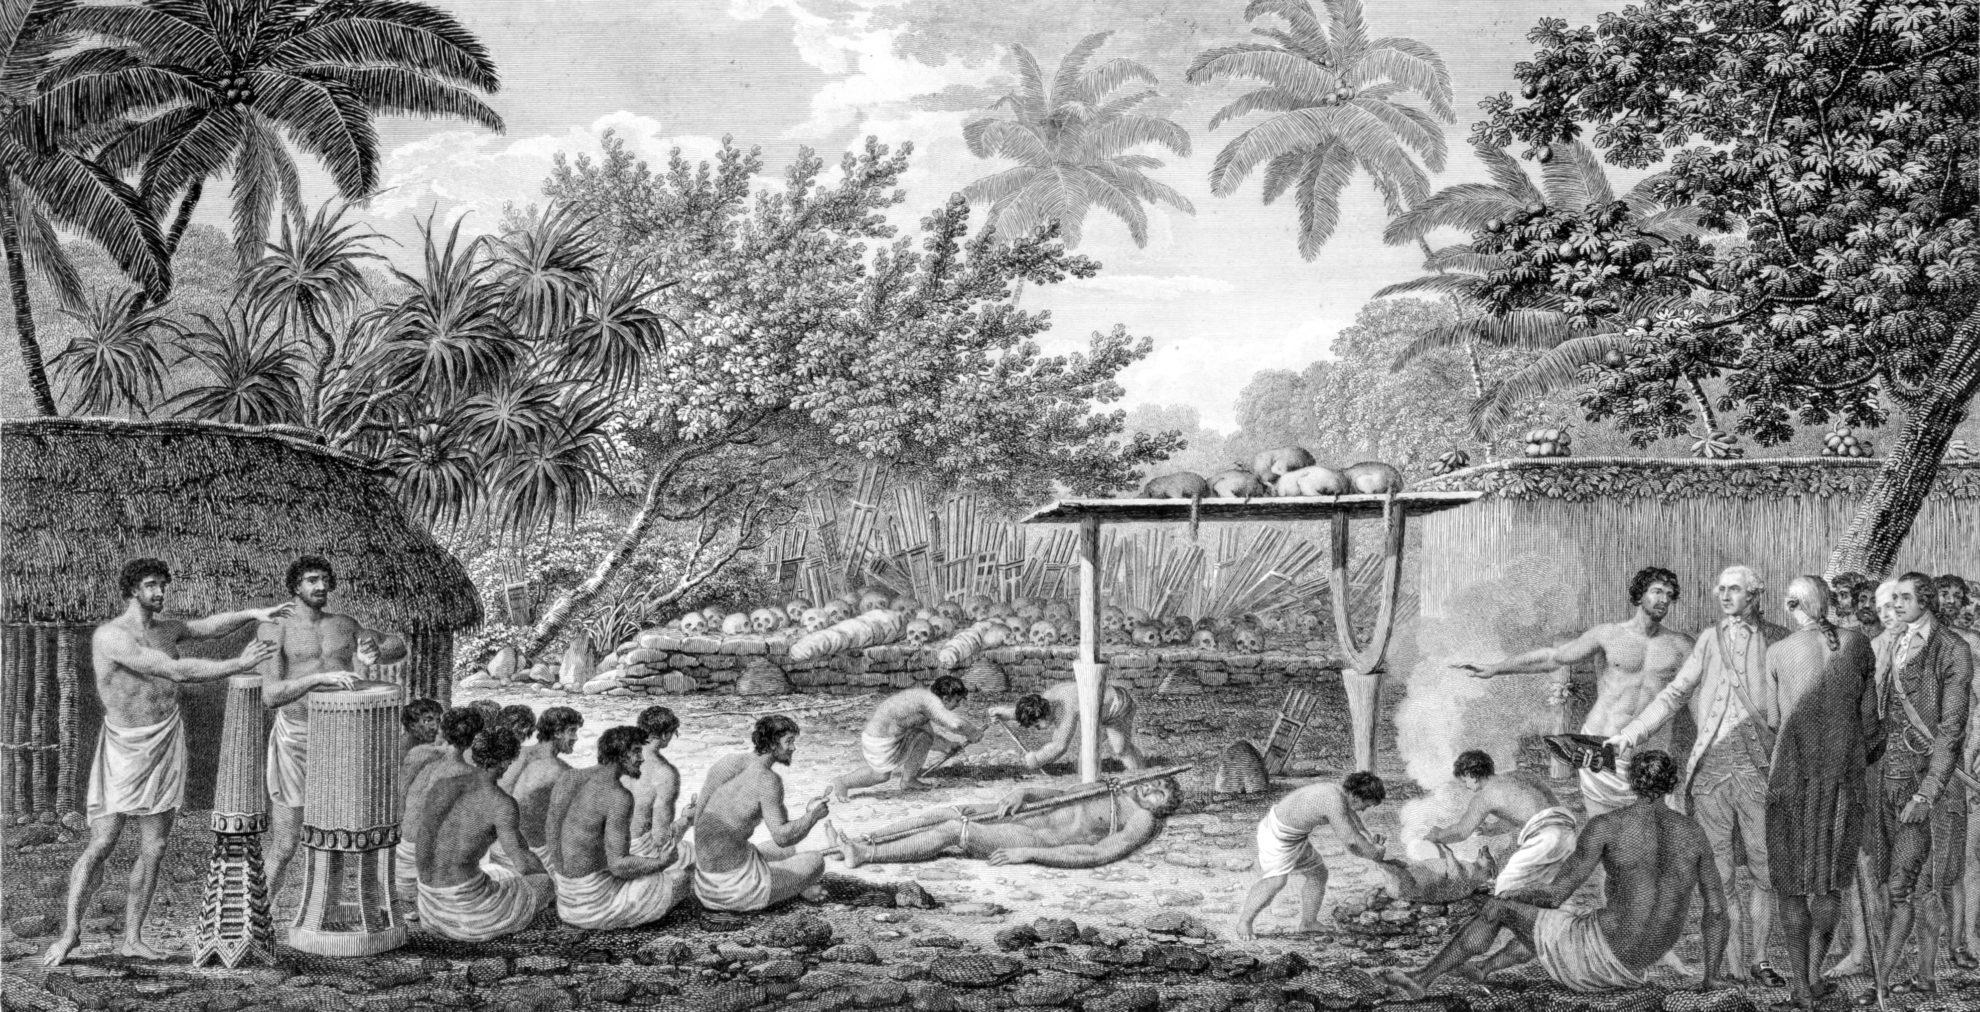 James_Cook,_English_navigator,_witnessing_human_sacrifice_in_Taihiti_(Otaheite)_c._1773 Кук наблюдает за человеческими жертвоприношениями на Таити (1773 год)